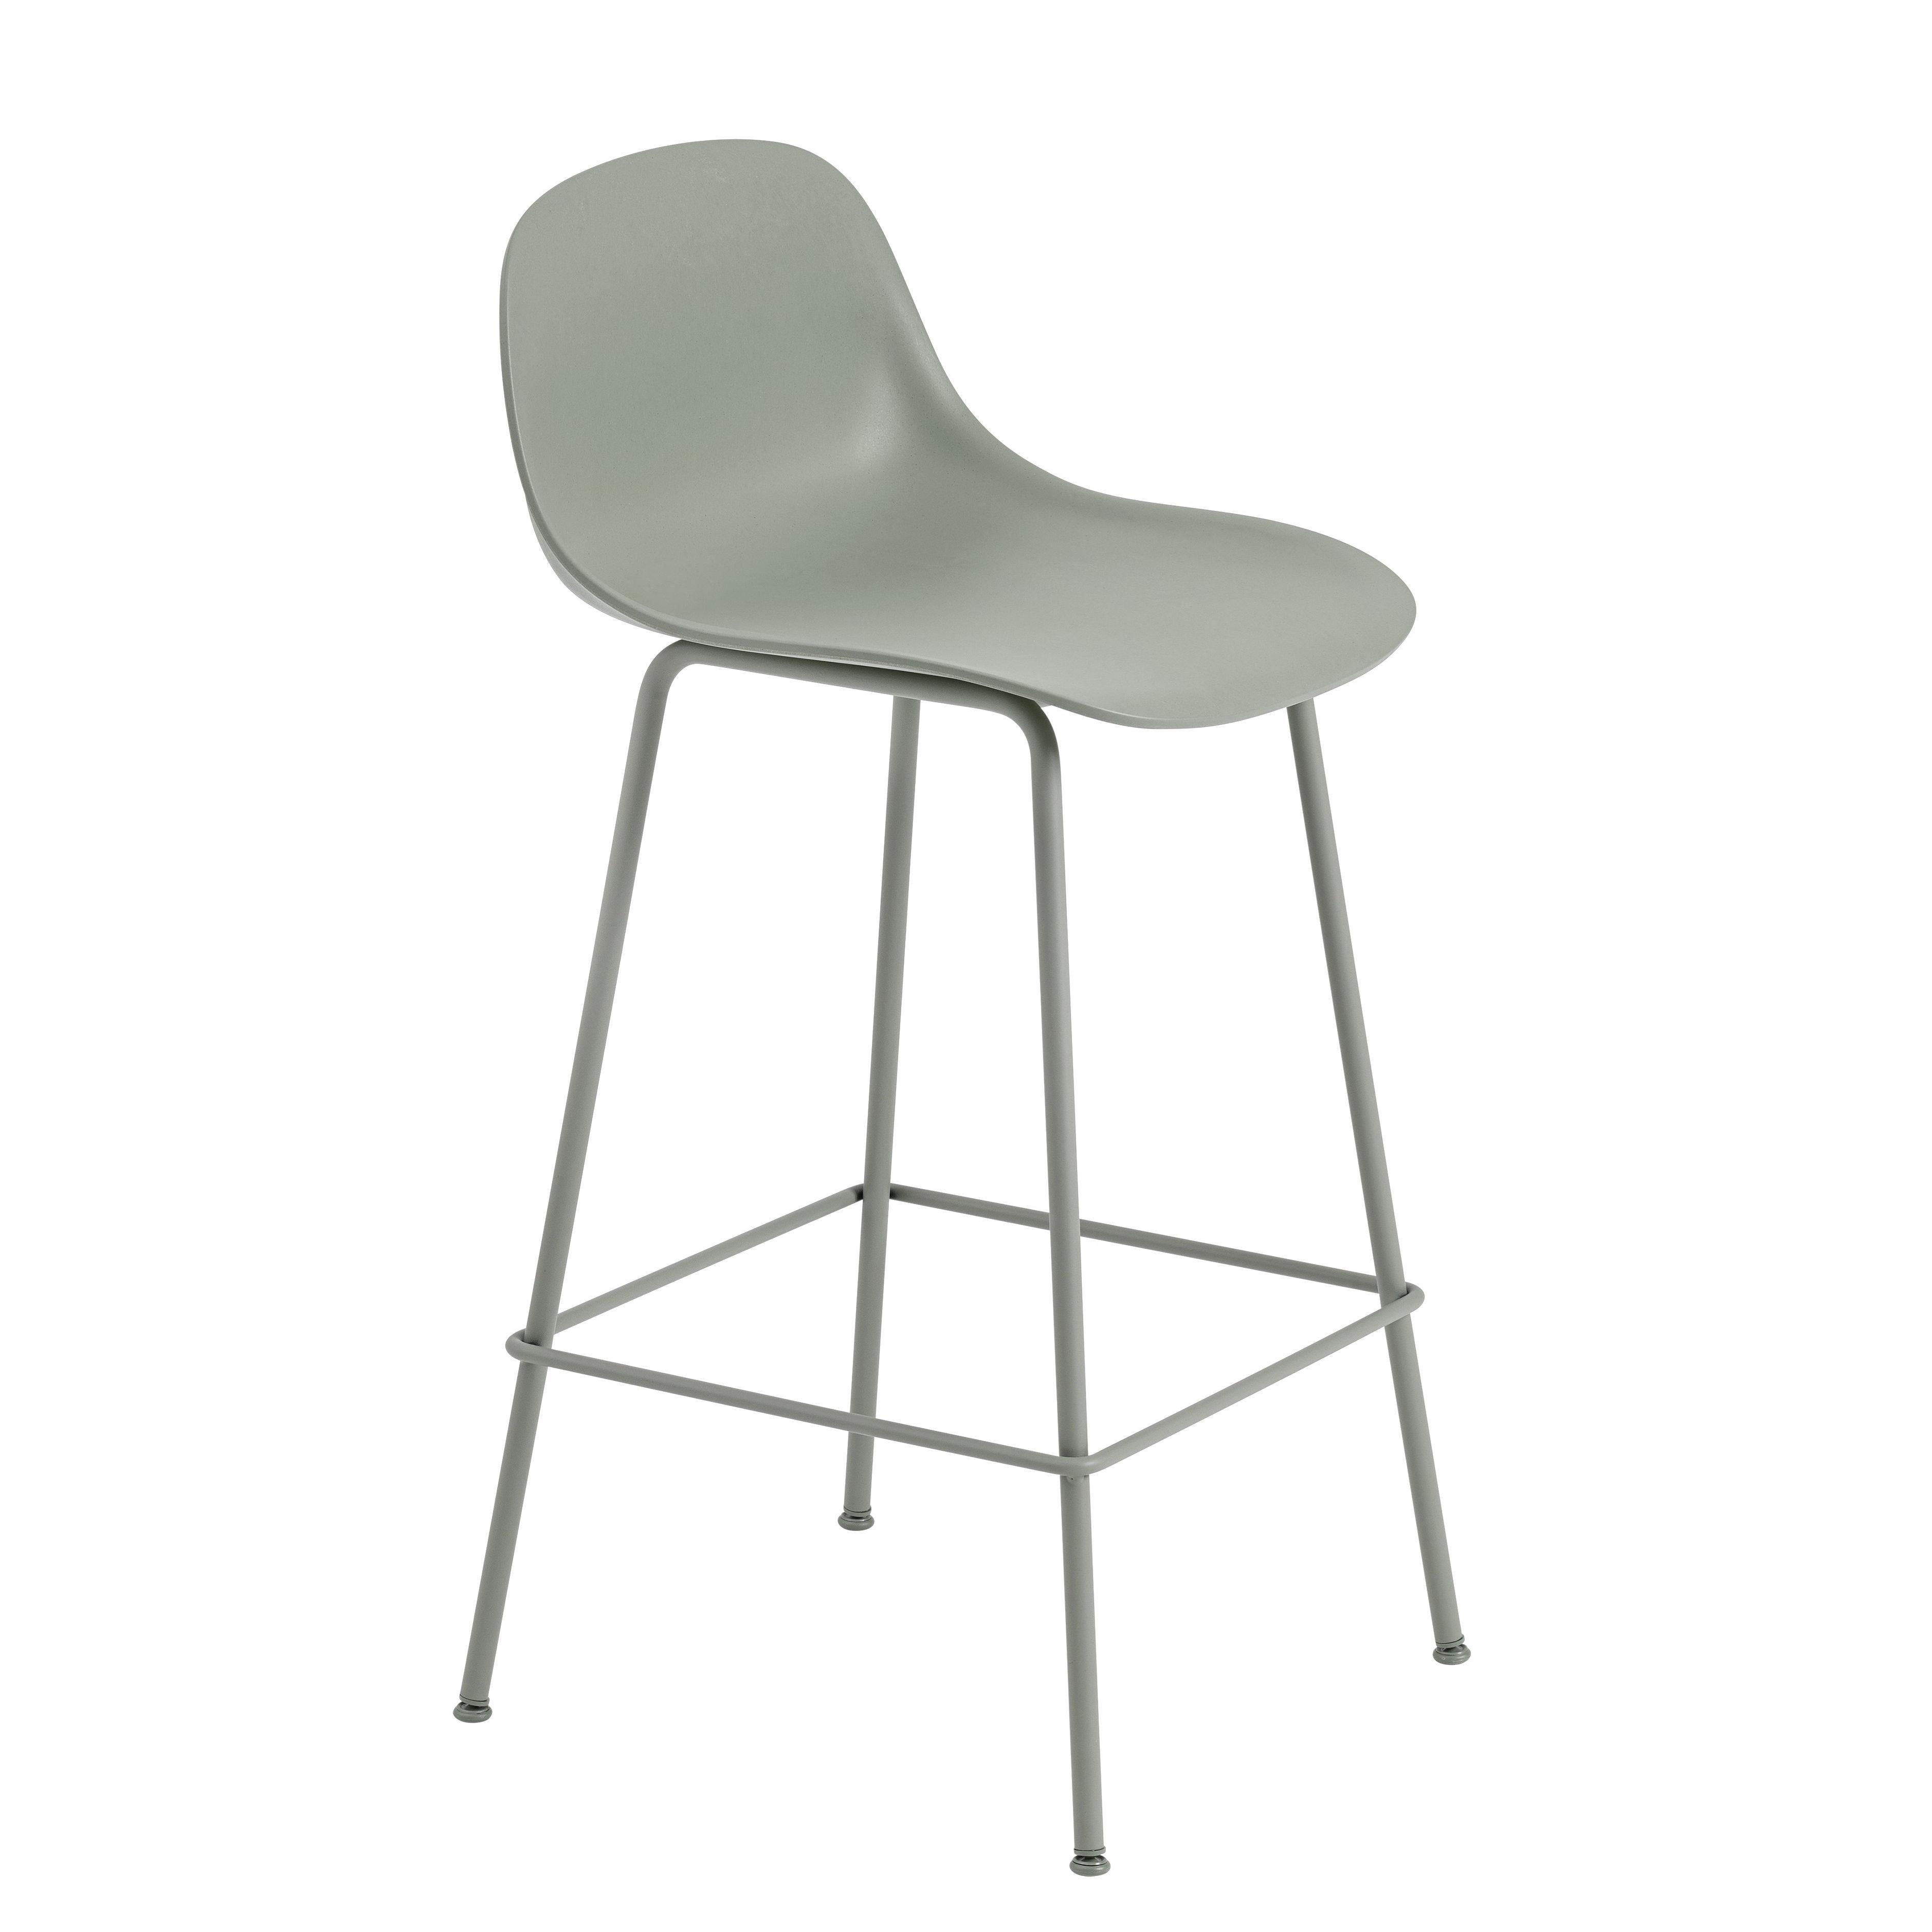 Möbel - Barhocker - Fiber Bar Hochstuhl / H 65 cm - Metallfüße - Muuto - Altgrün - bemalter Stahl, Recyceltes Verbundmaterial